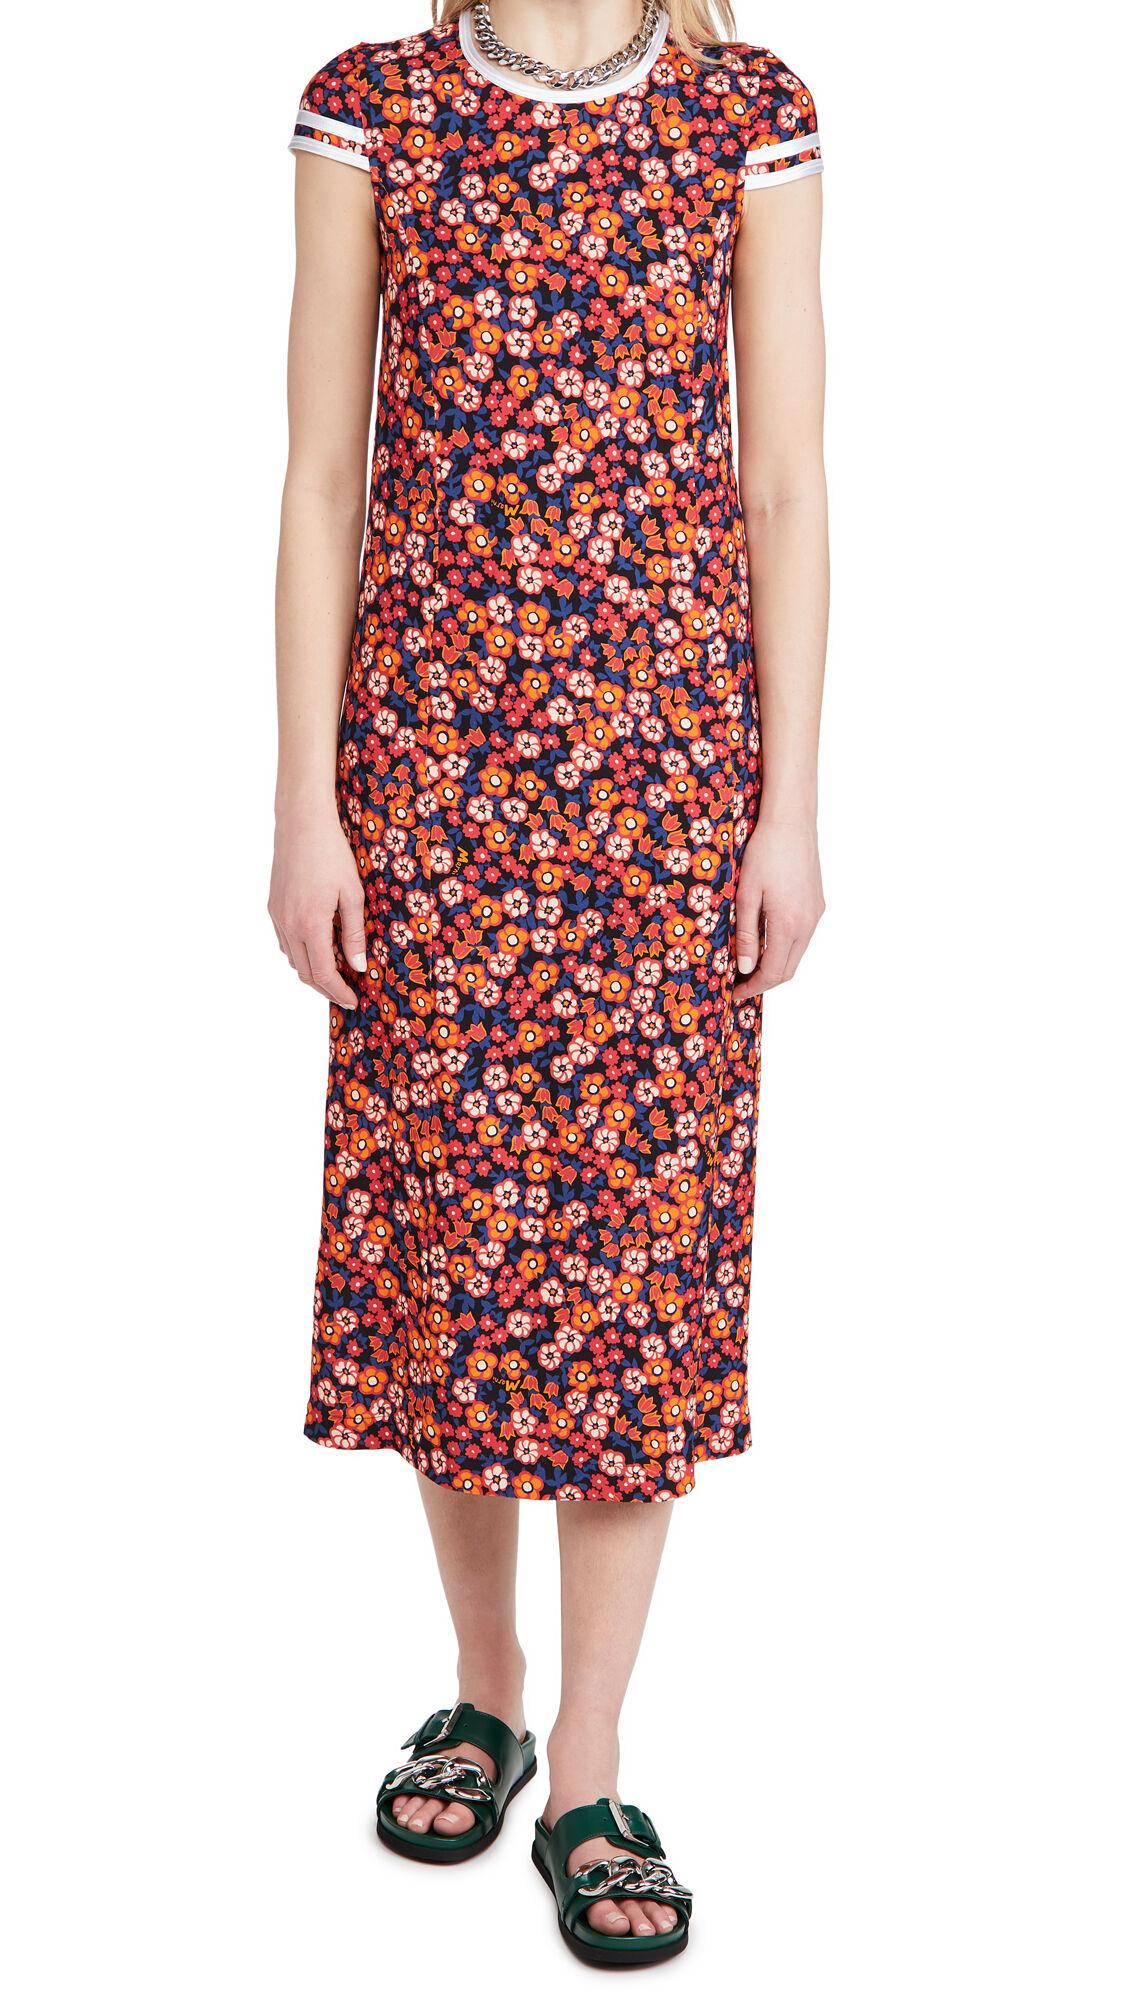 Marni Short Sleeve Dress  - Pop Garden Print - Size: 40